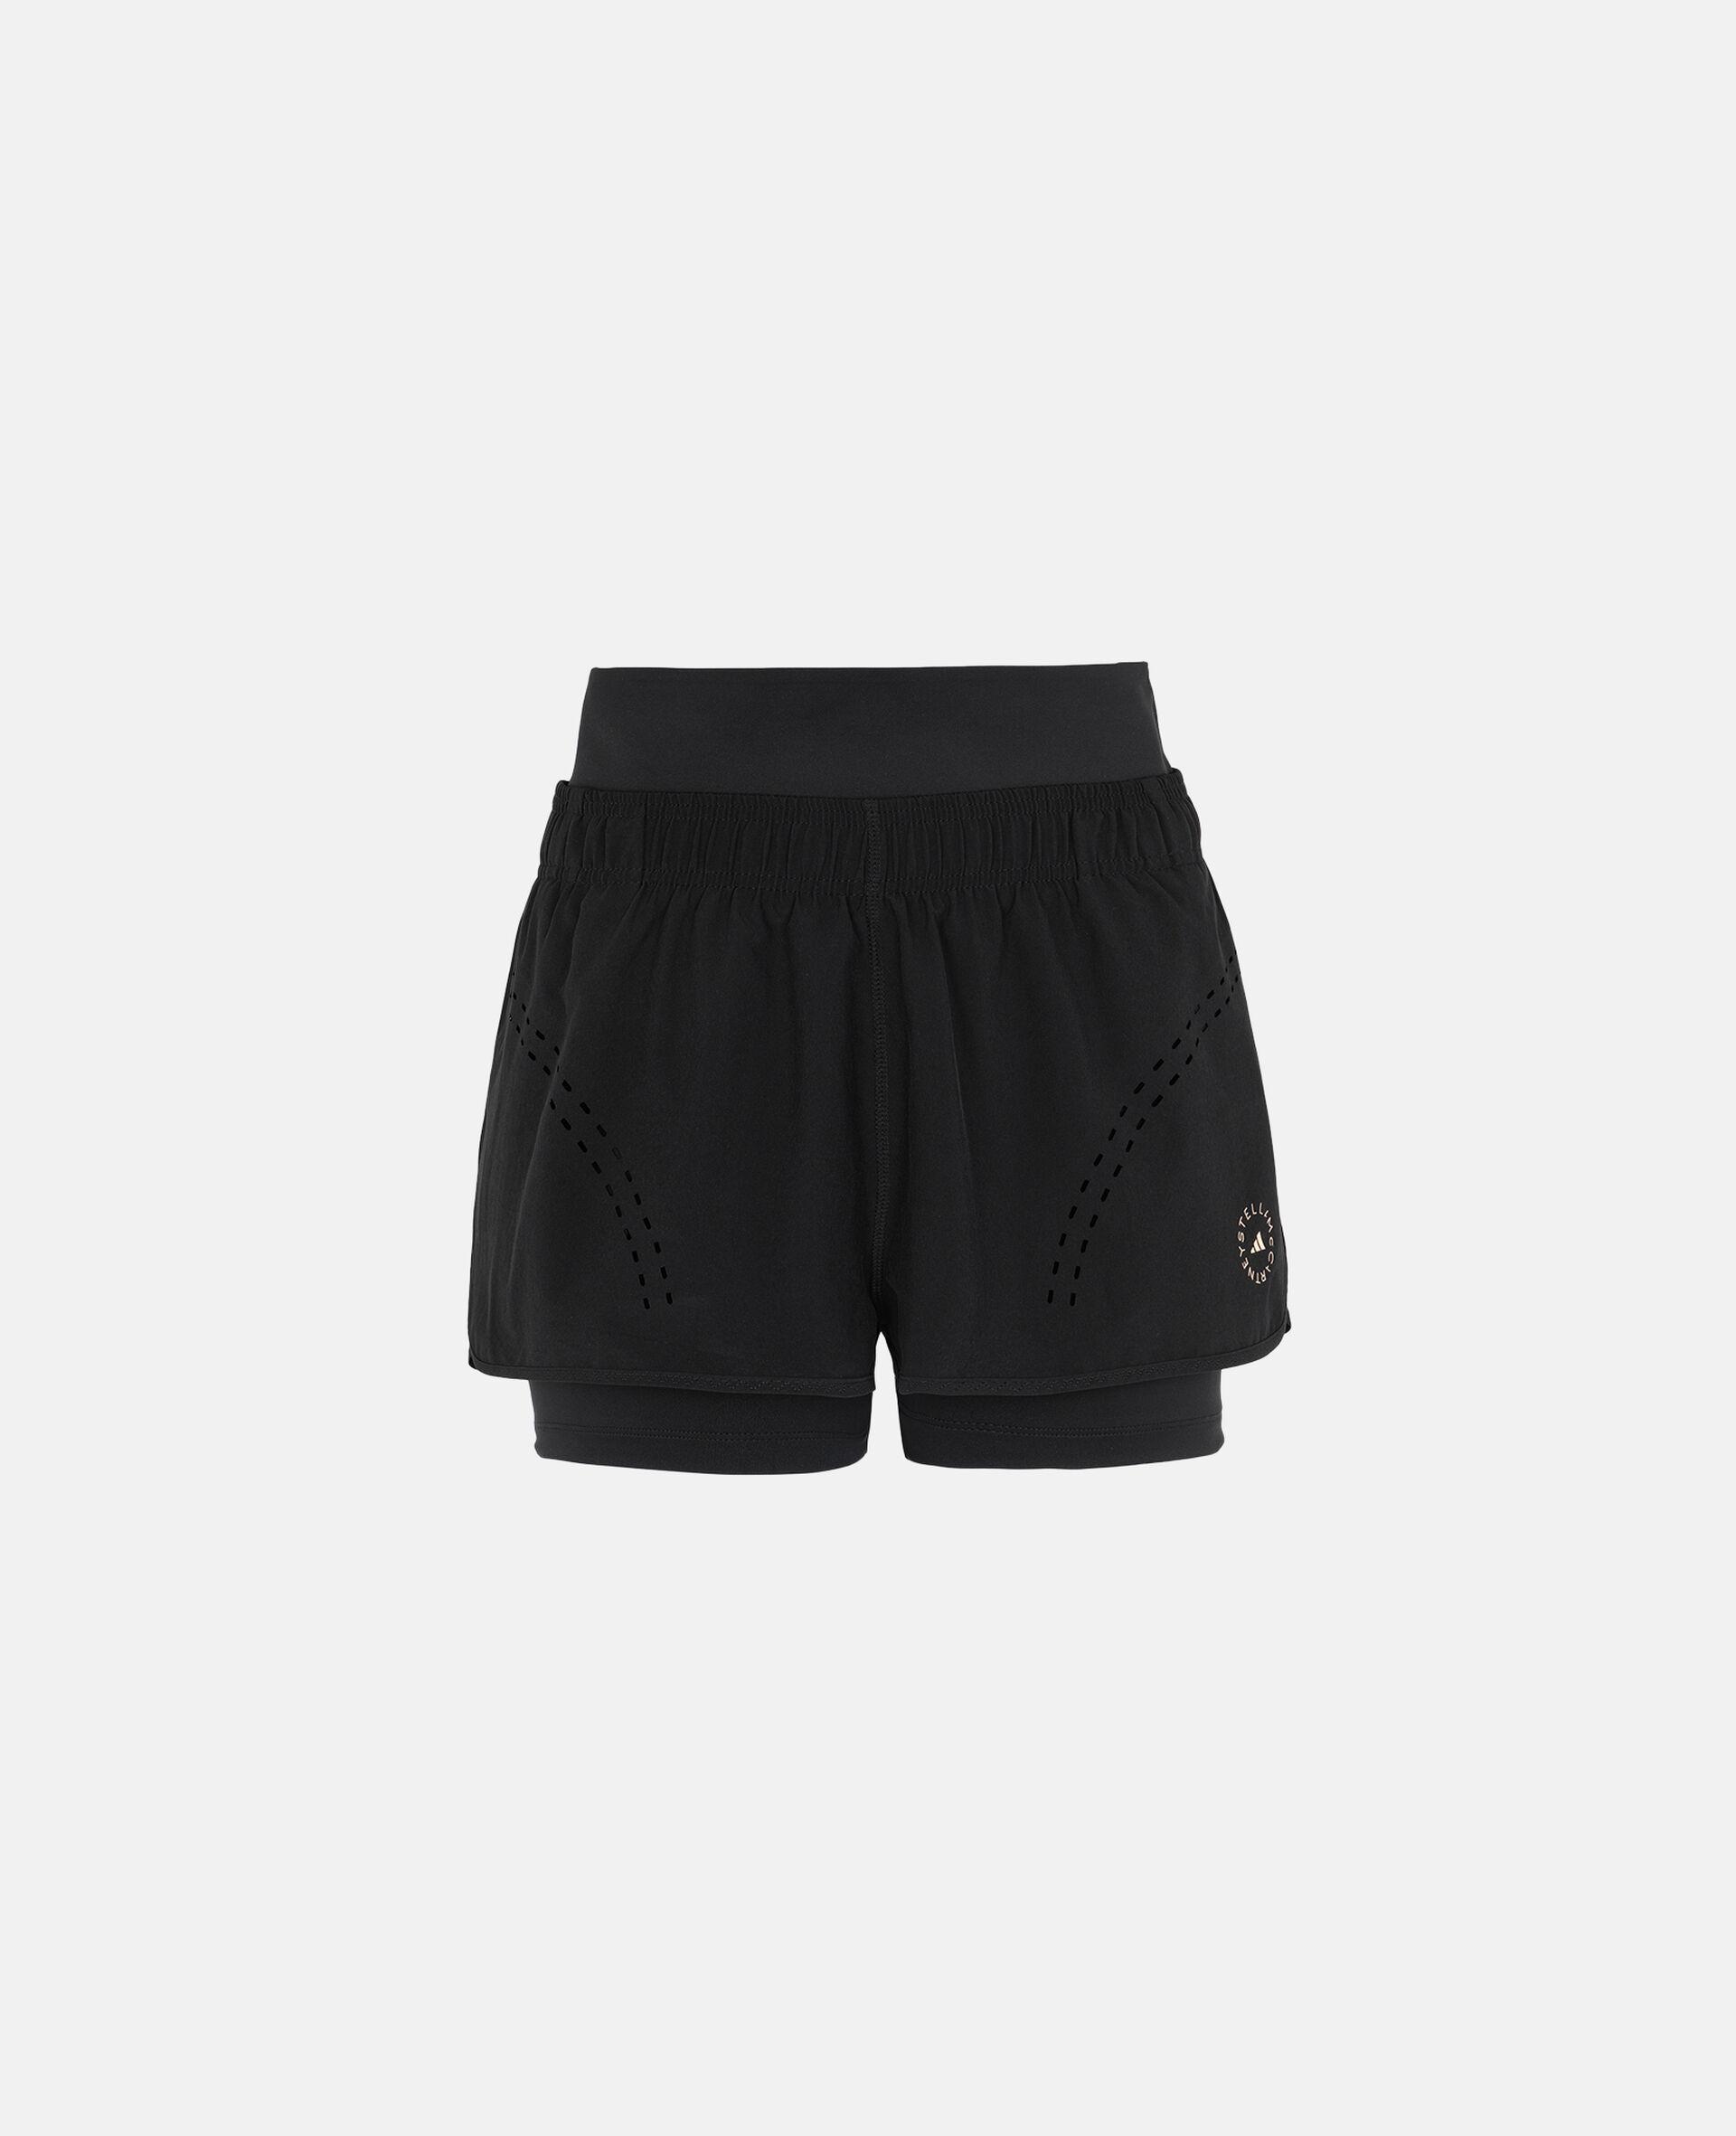 Schwarze TruePurpose Sport-Shorts-Schwarz-large image number 4